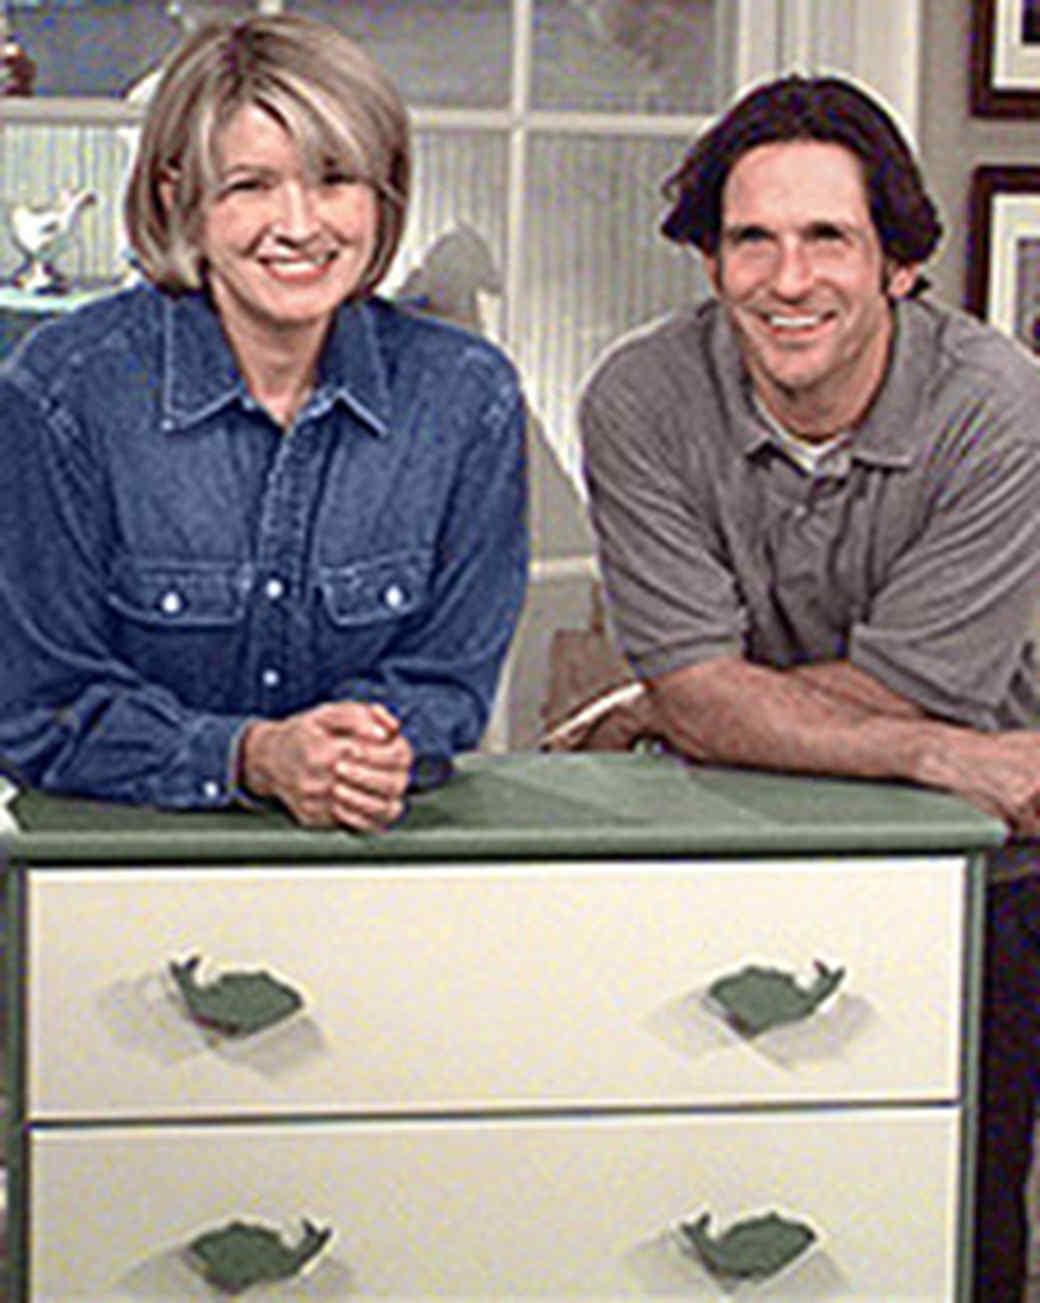 Fish-Shaped Dresser Pulls